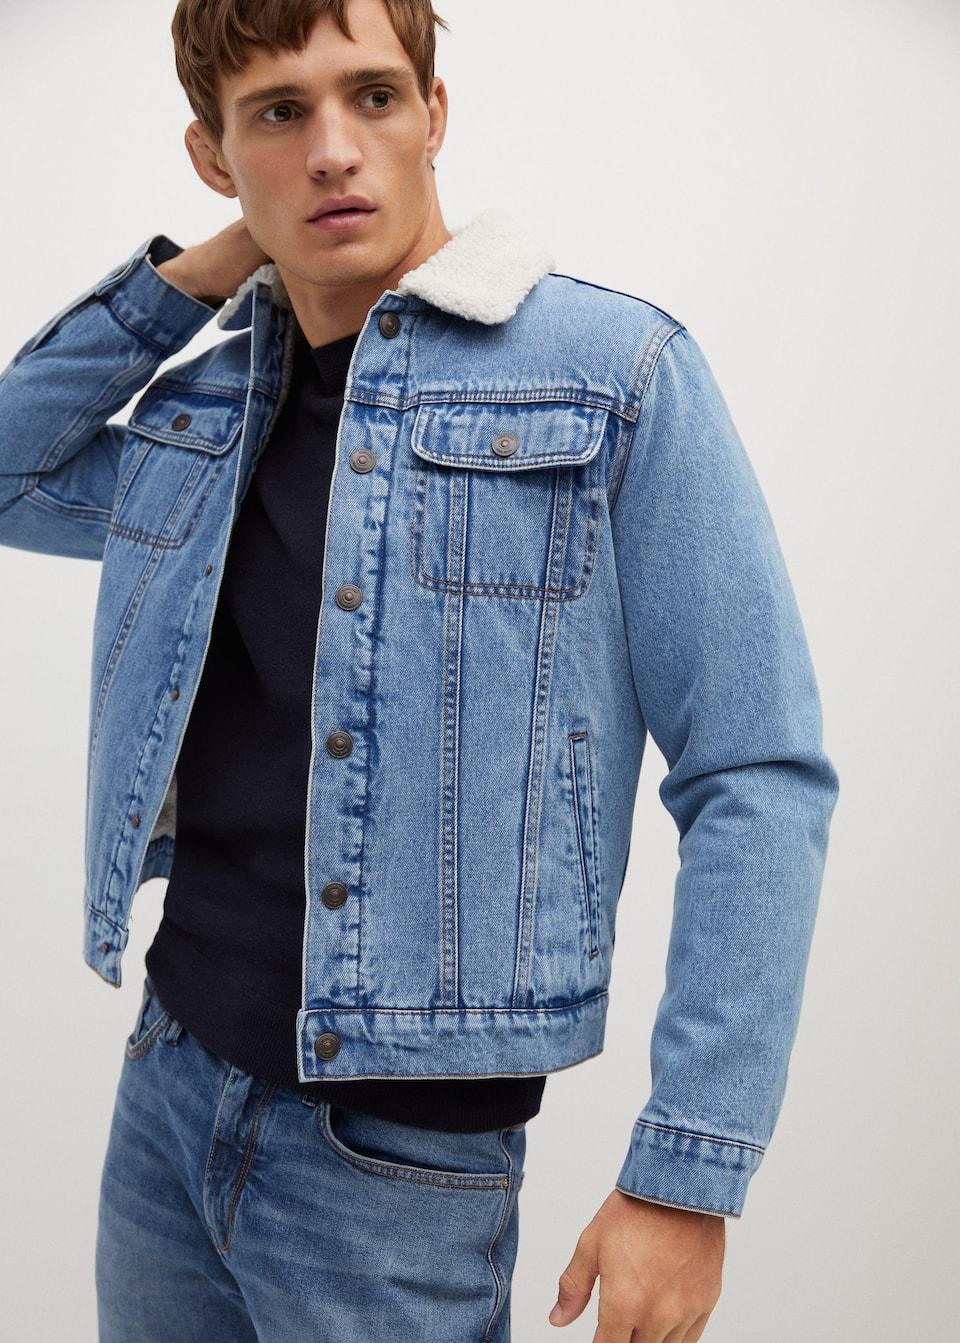 shearling / pile jacket